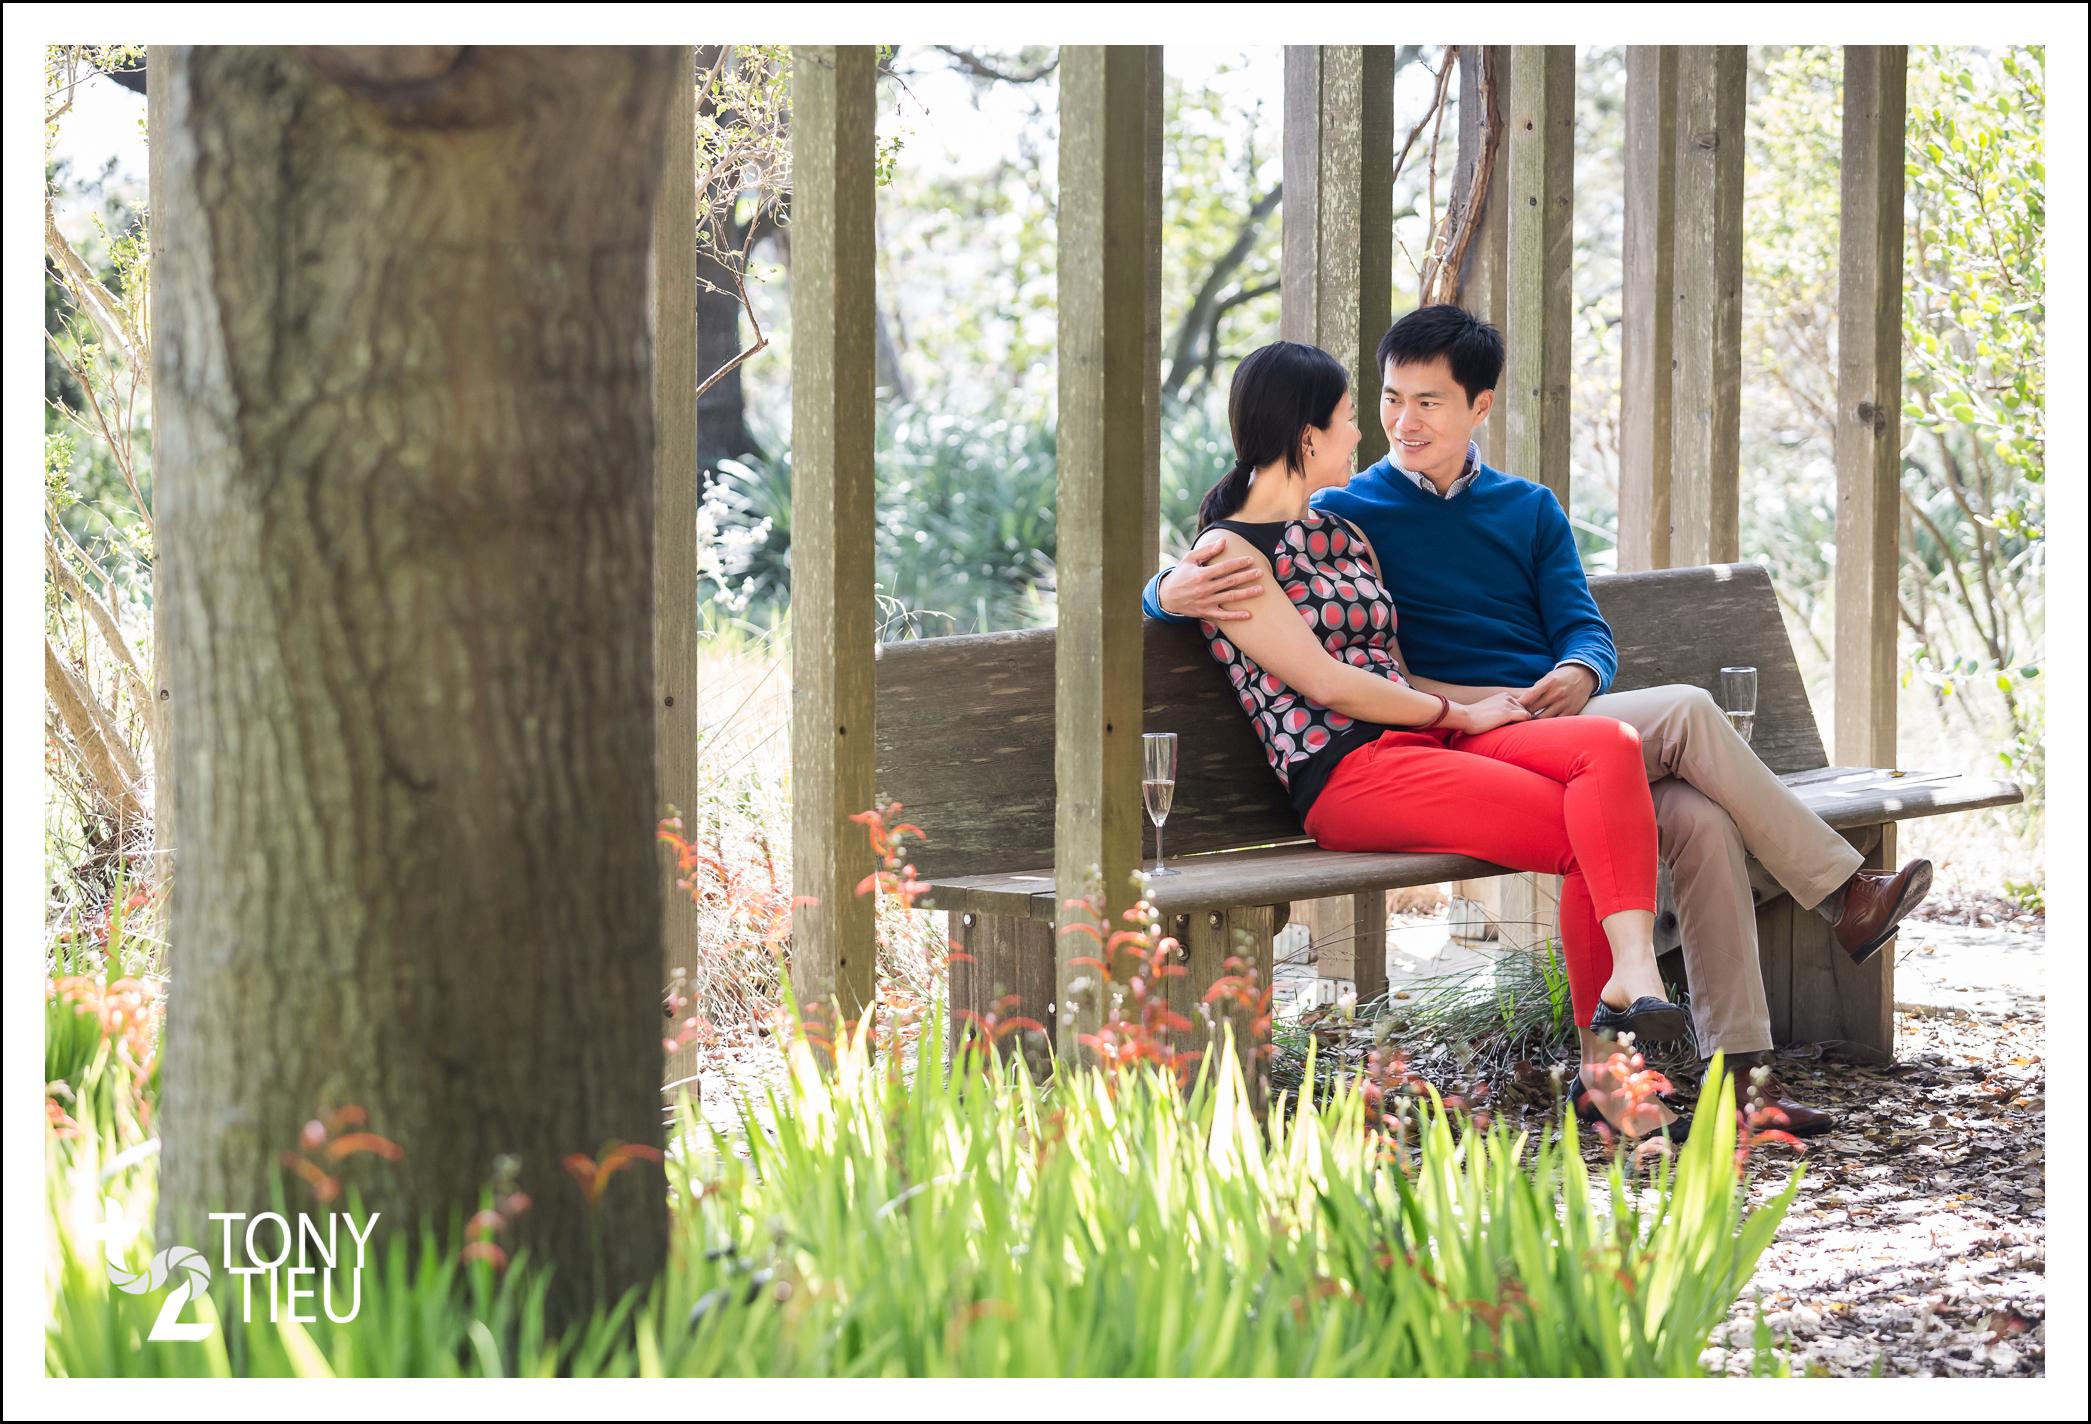 Tony_Tieu_Yang Jimmy_Engagement_17